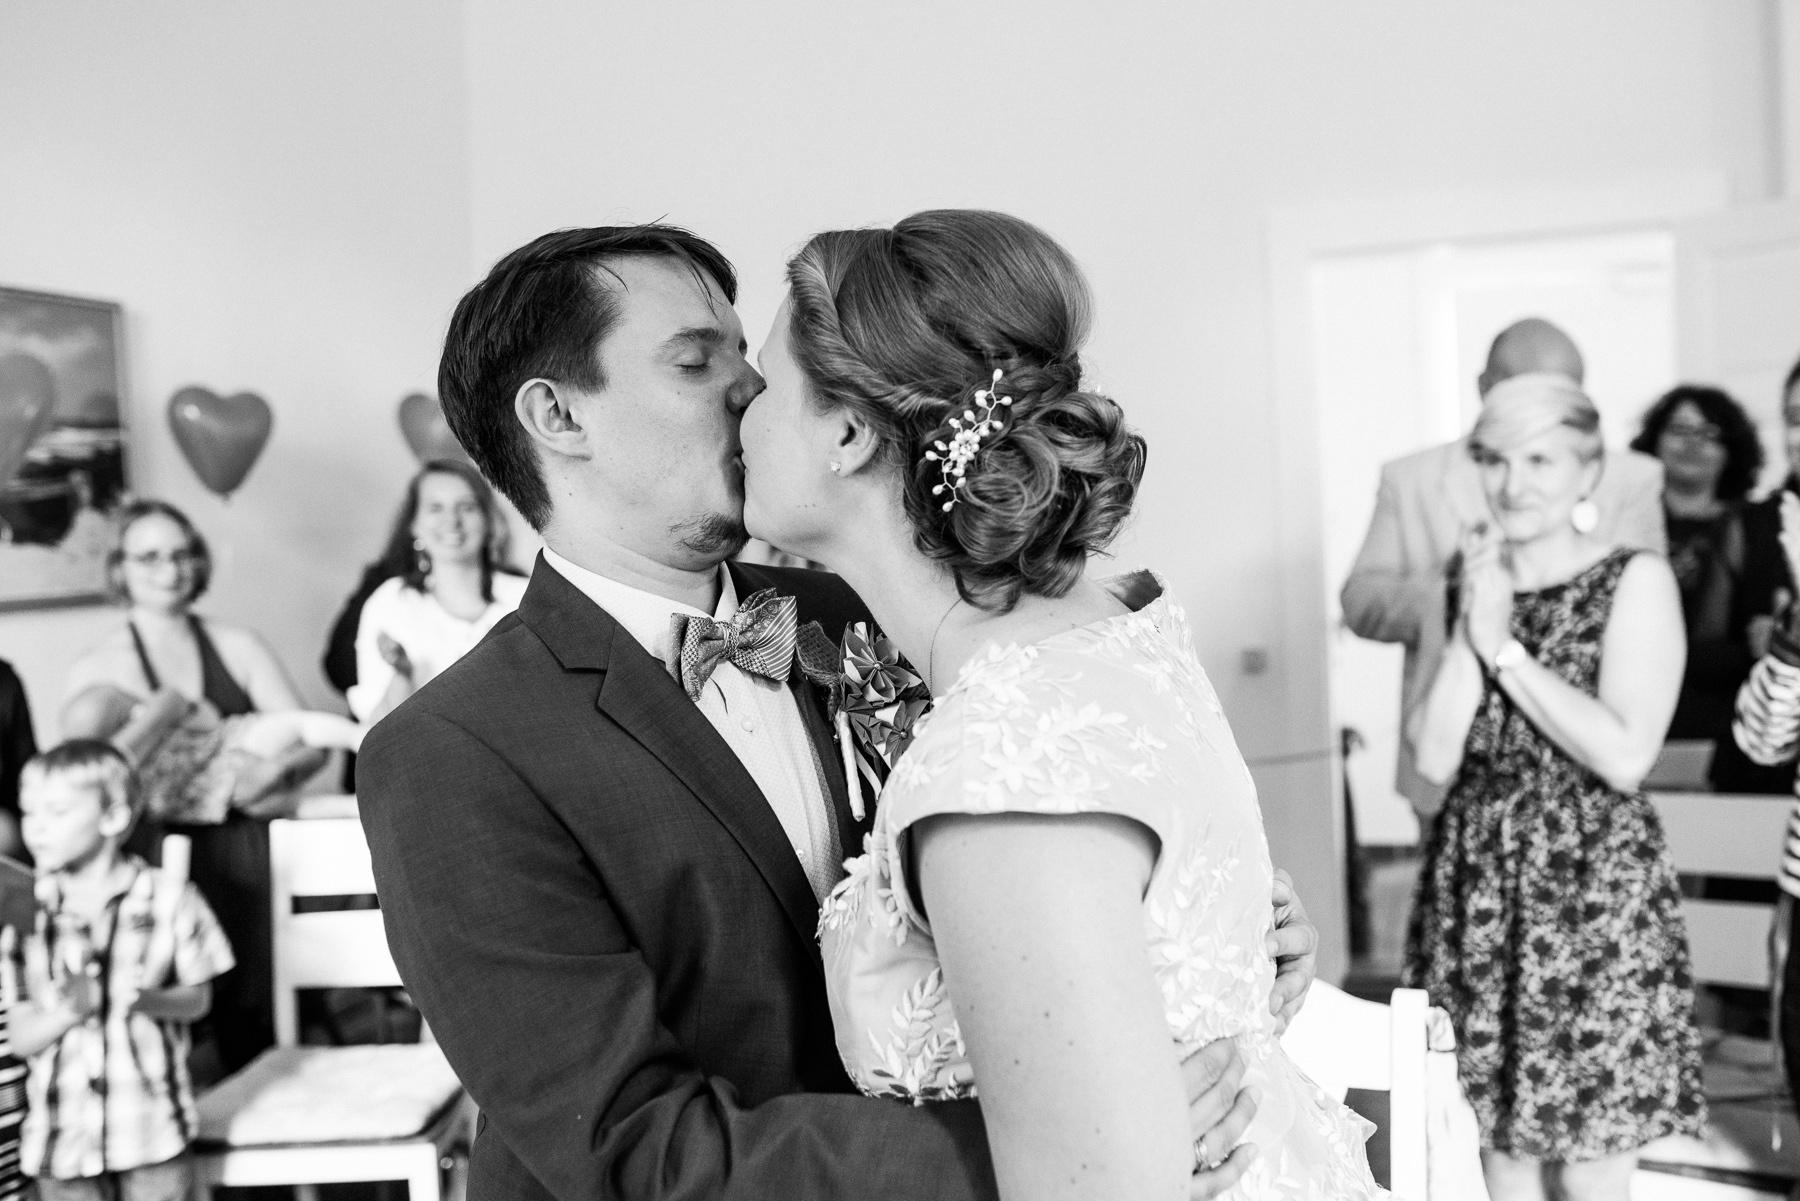 Conny&Micha_XeniaBluhm-43.jpg